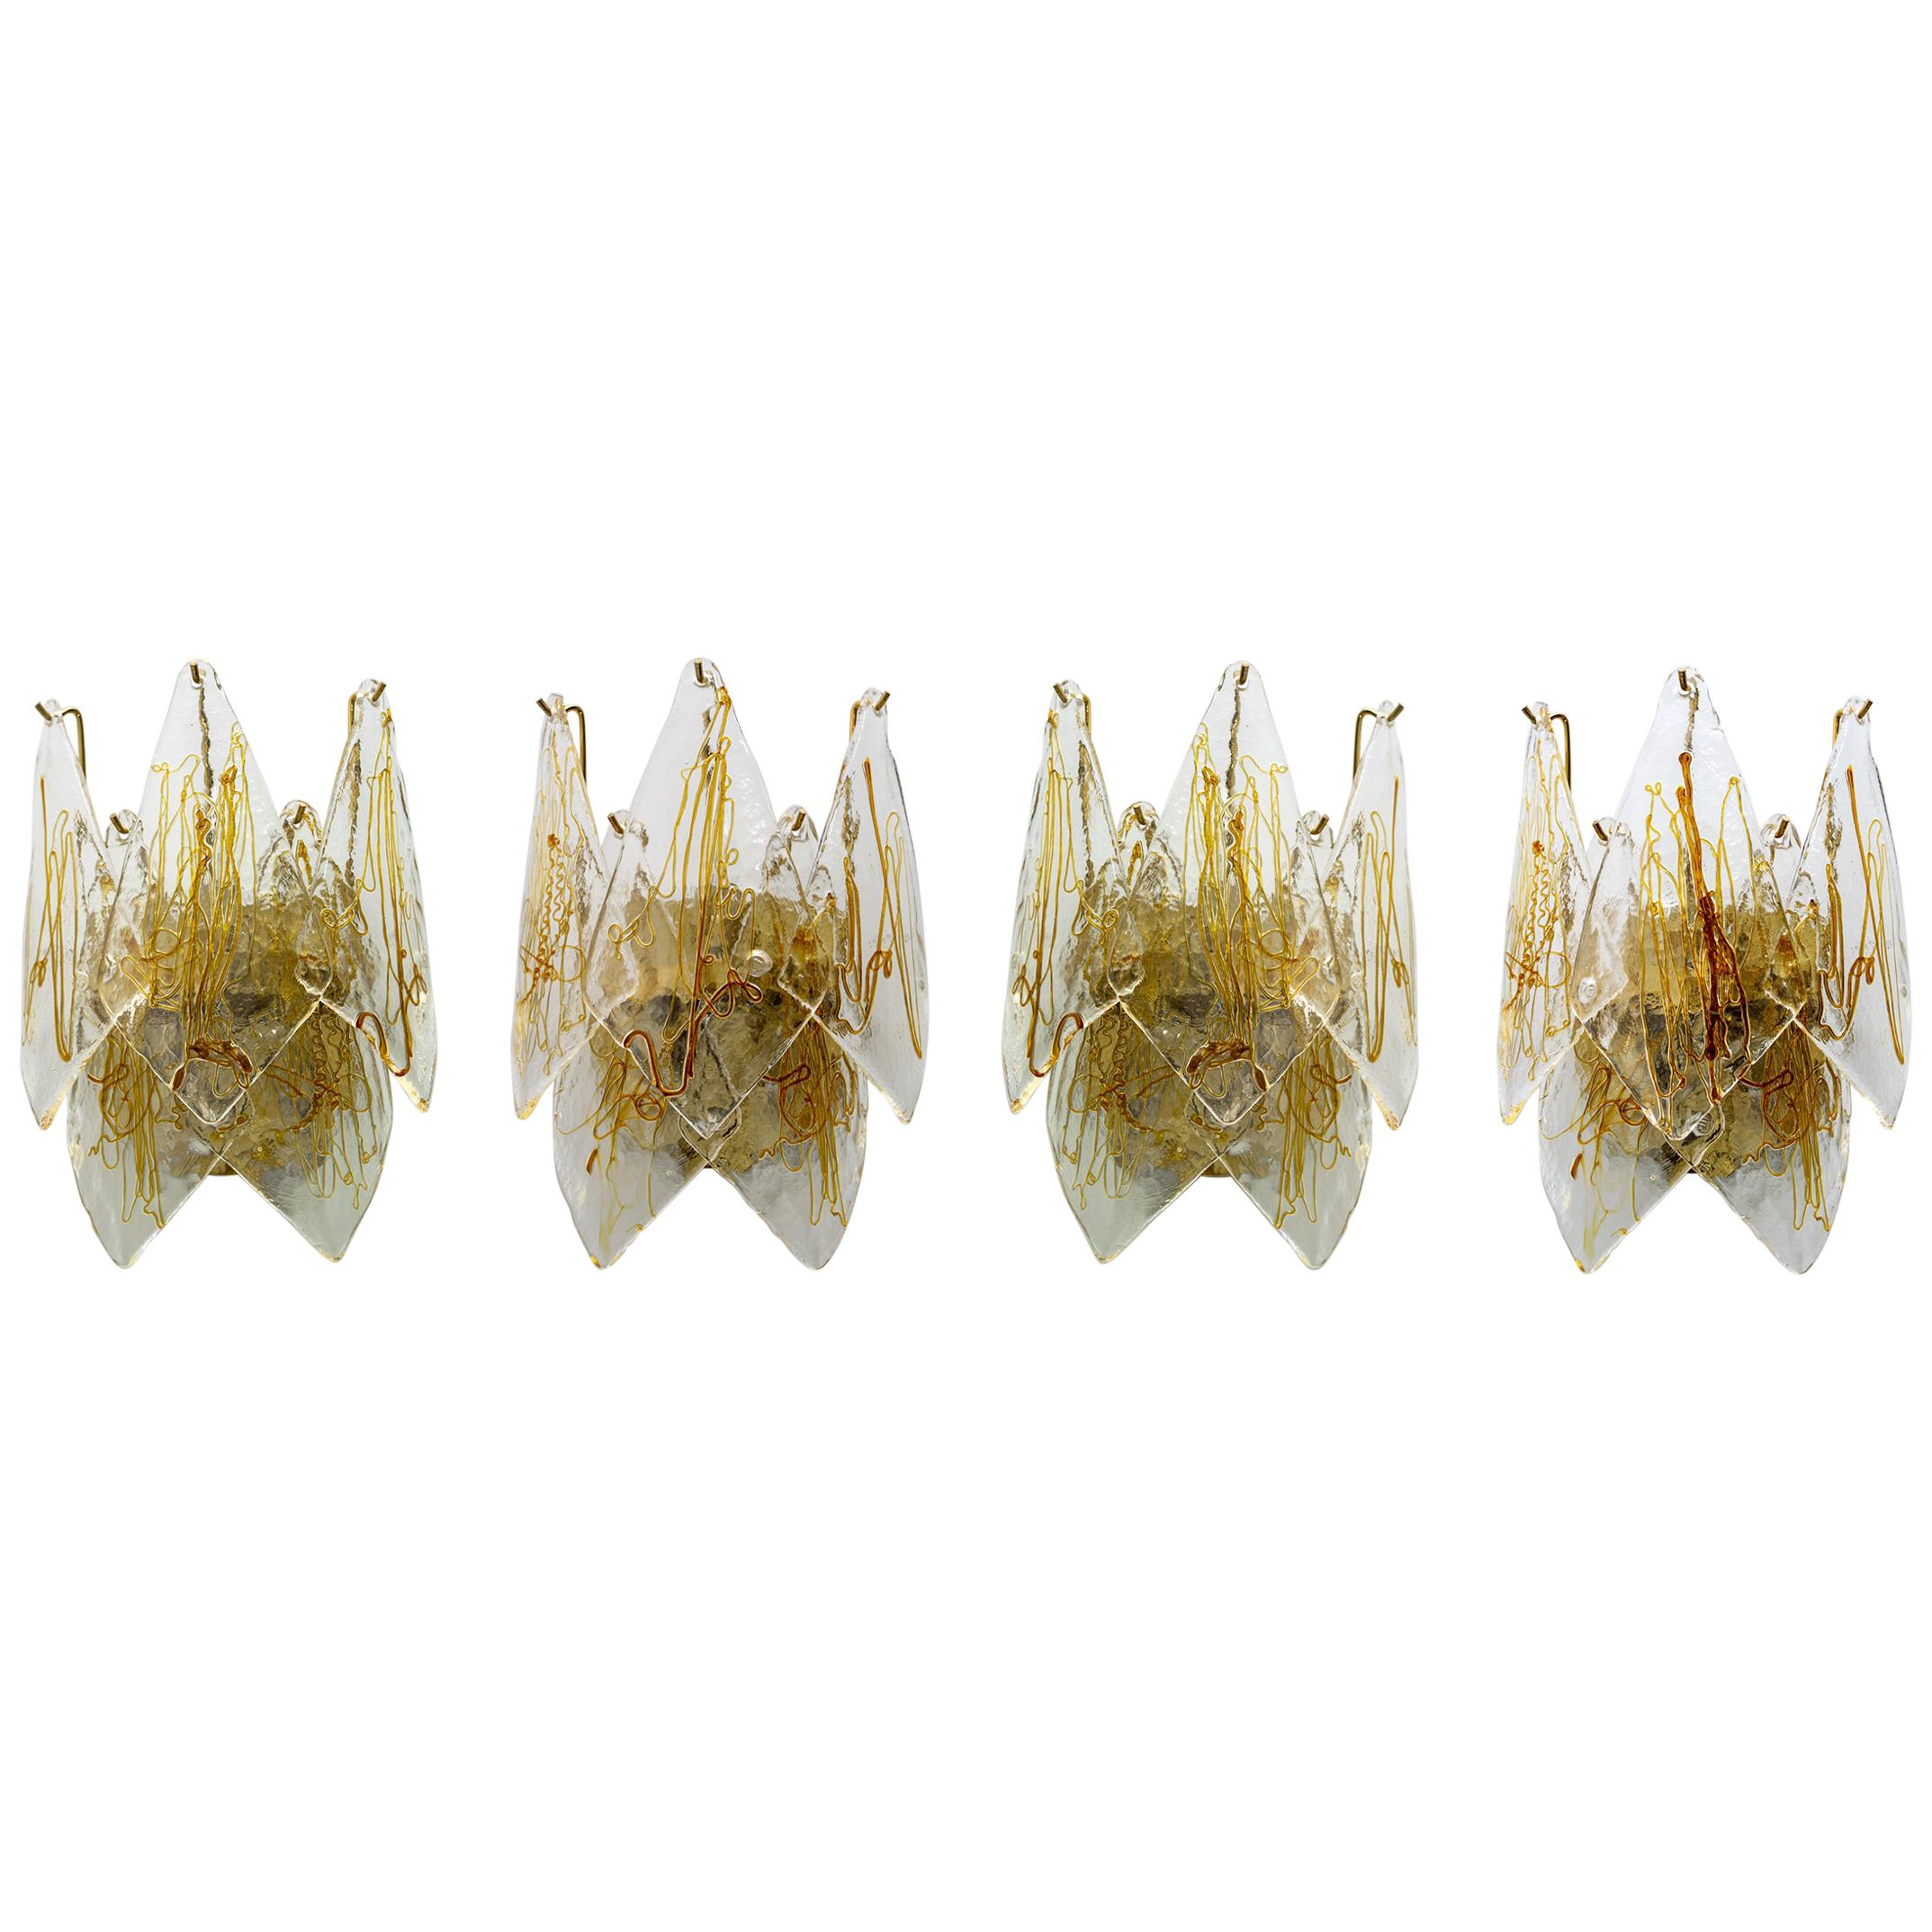 Four La Murrina Midcentury Italian Wall Lamps in Murano Glass and Brass, 1960s